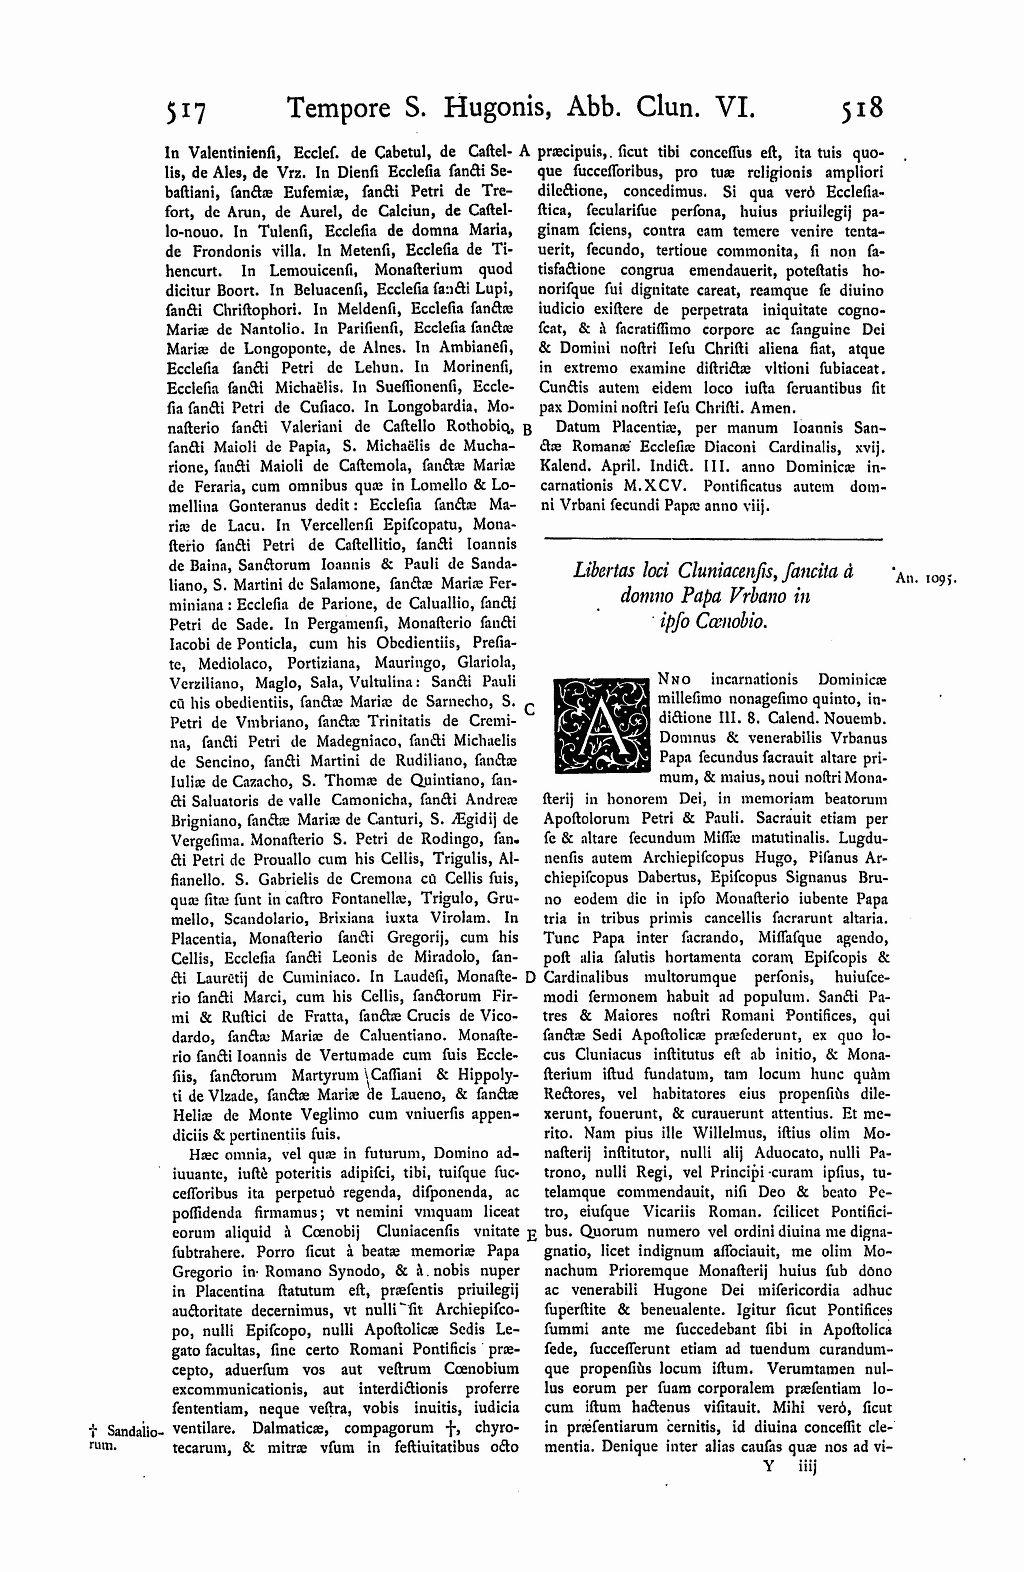 Bibliotheca cluniacensis